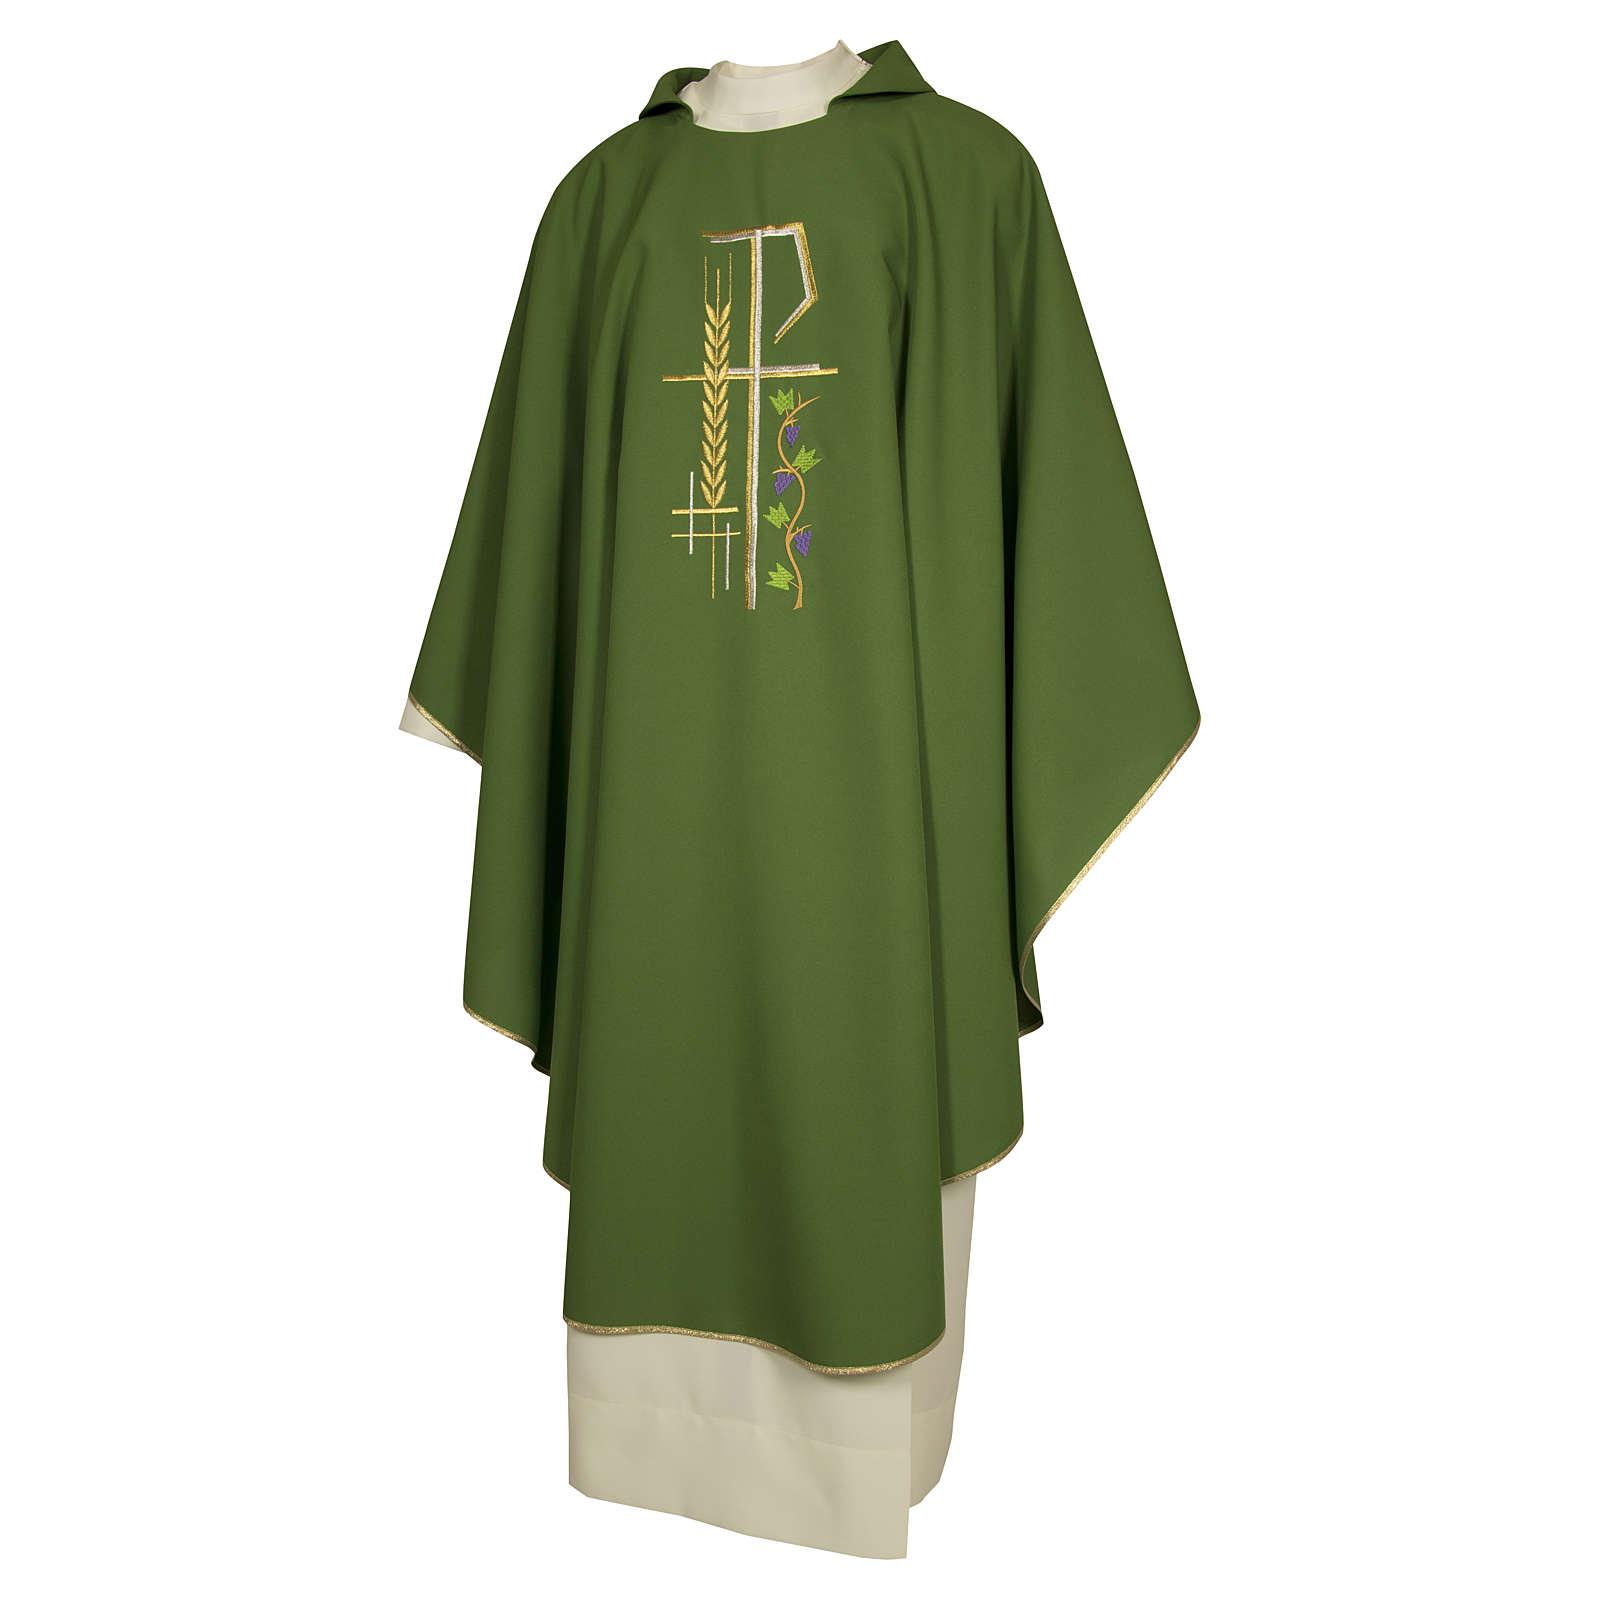 Casula sacerdotale 100% poliestere croce spiga foglia 4